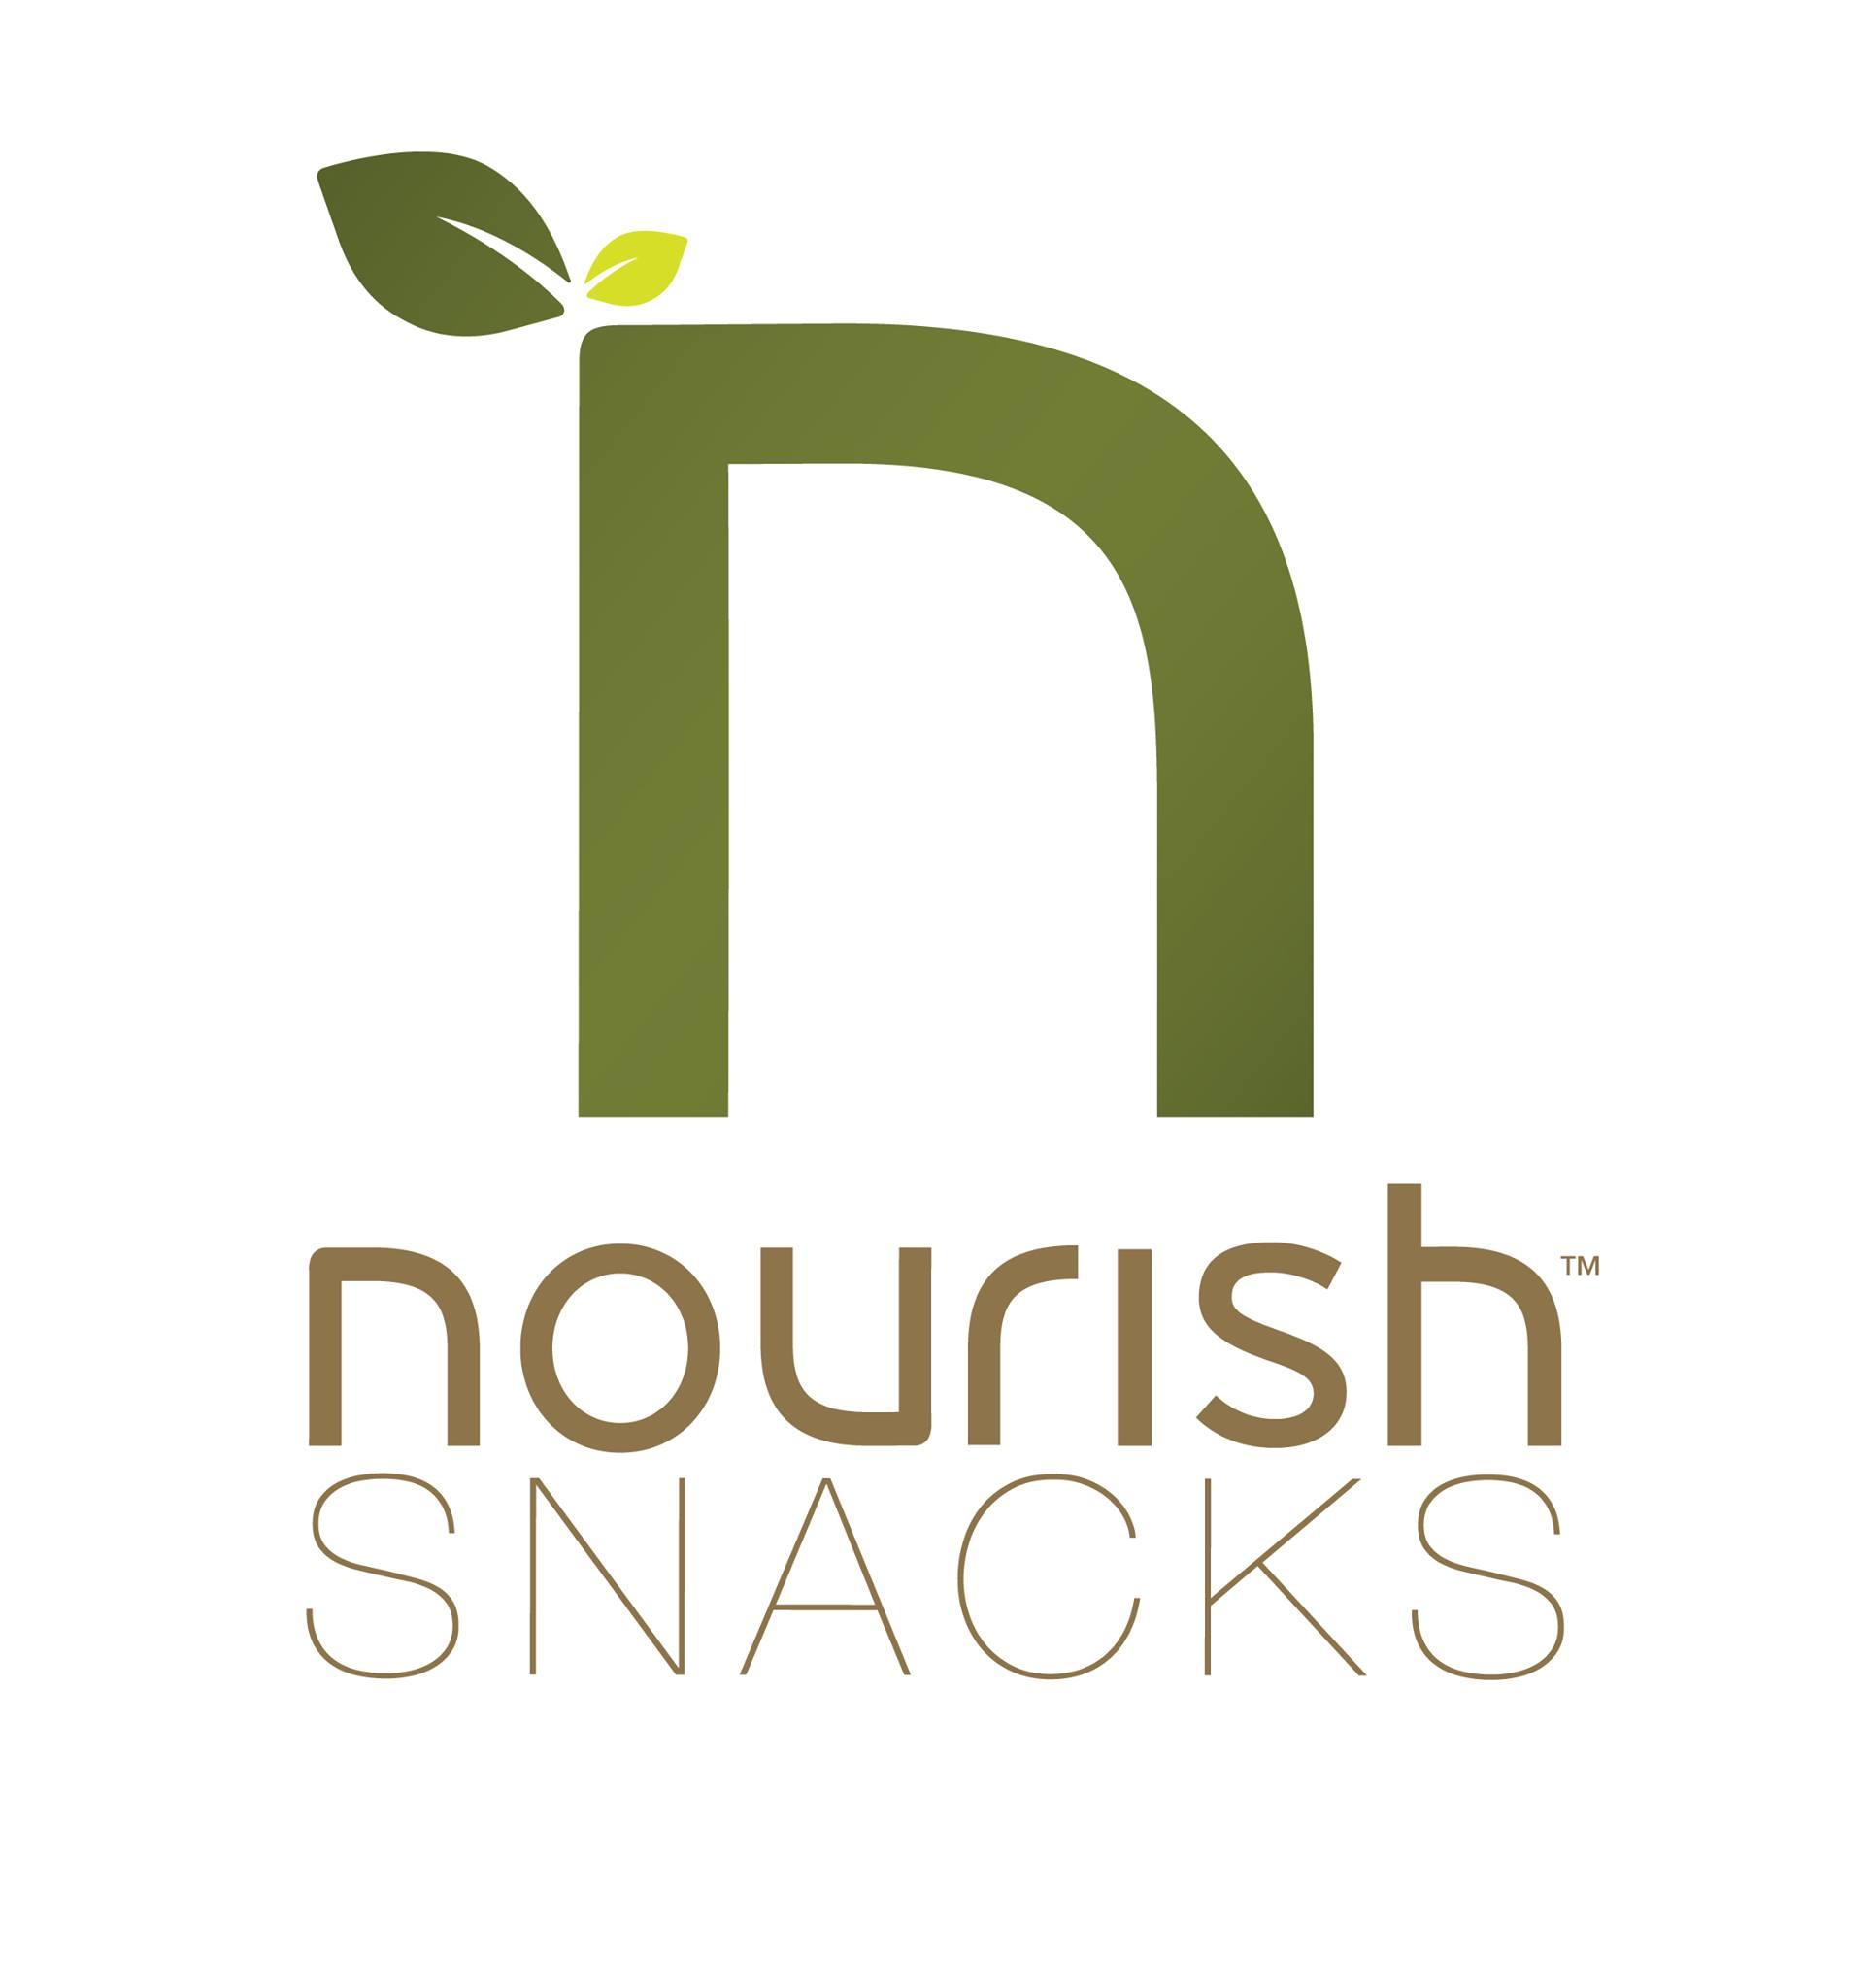 nourish snack logo